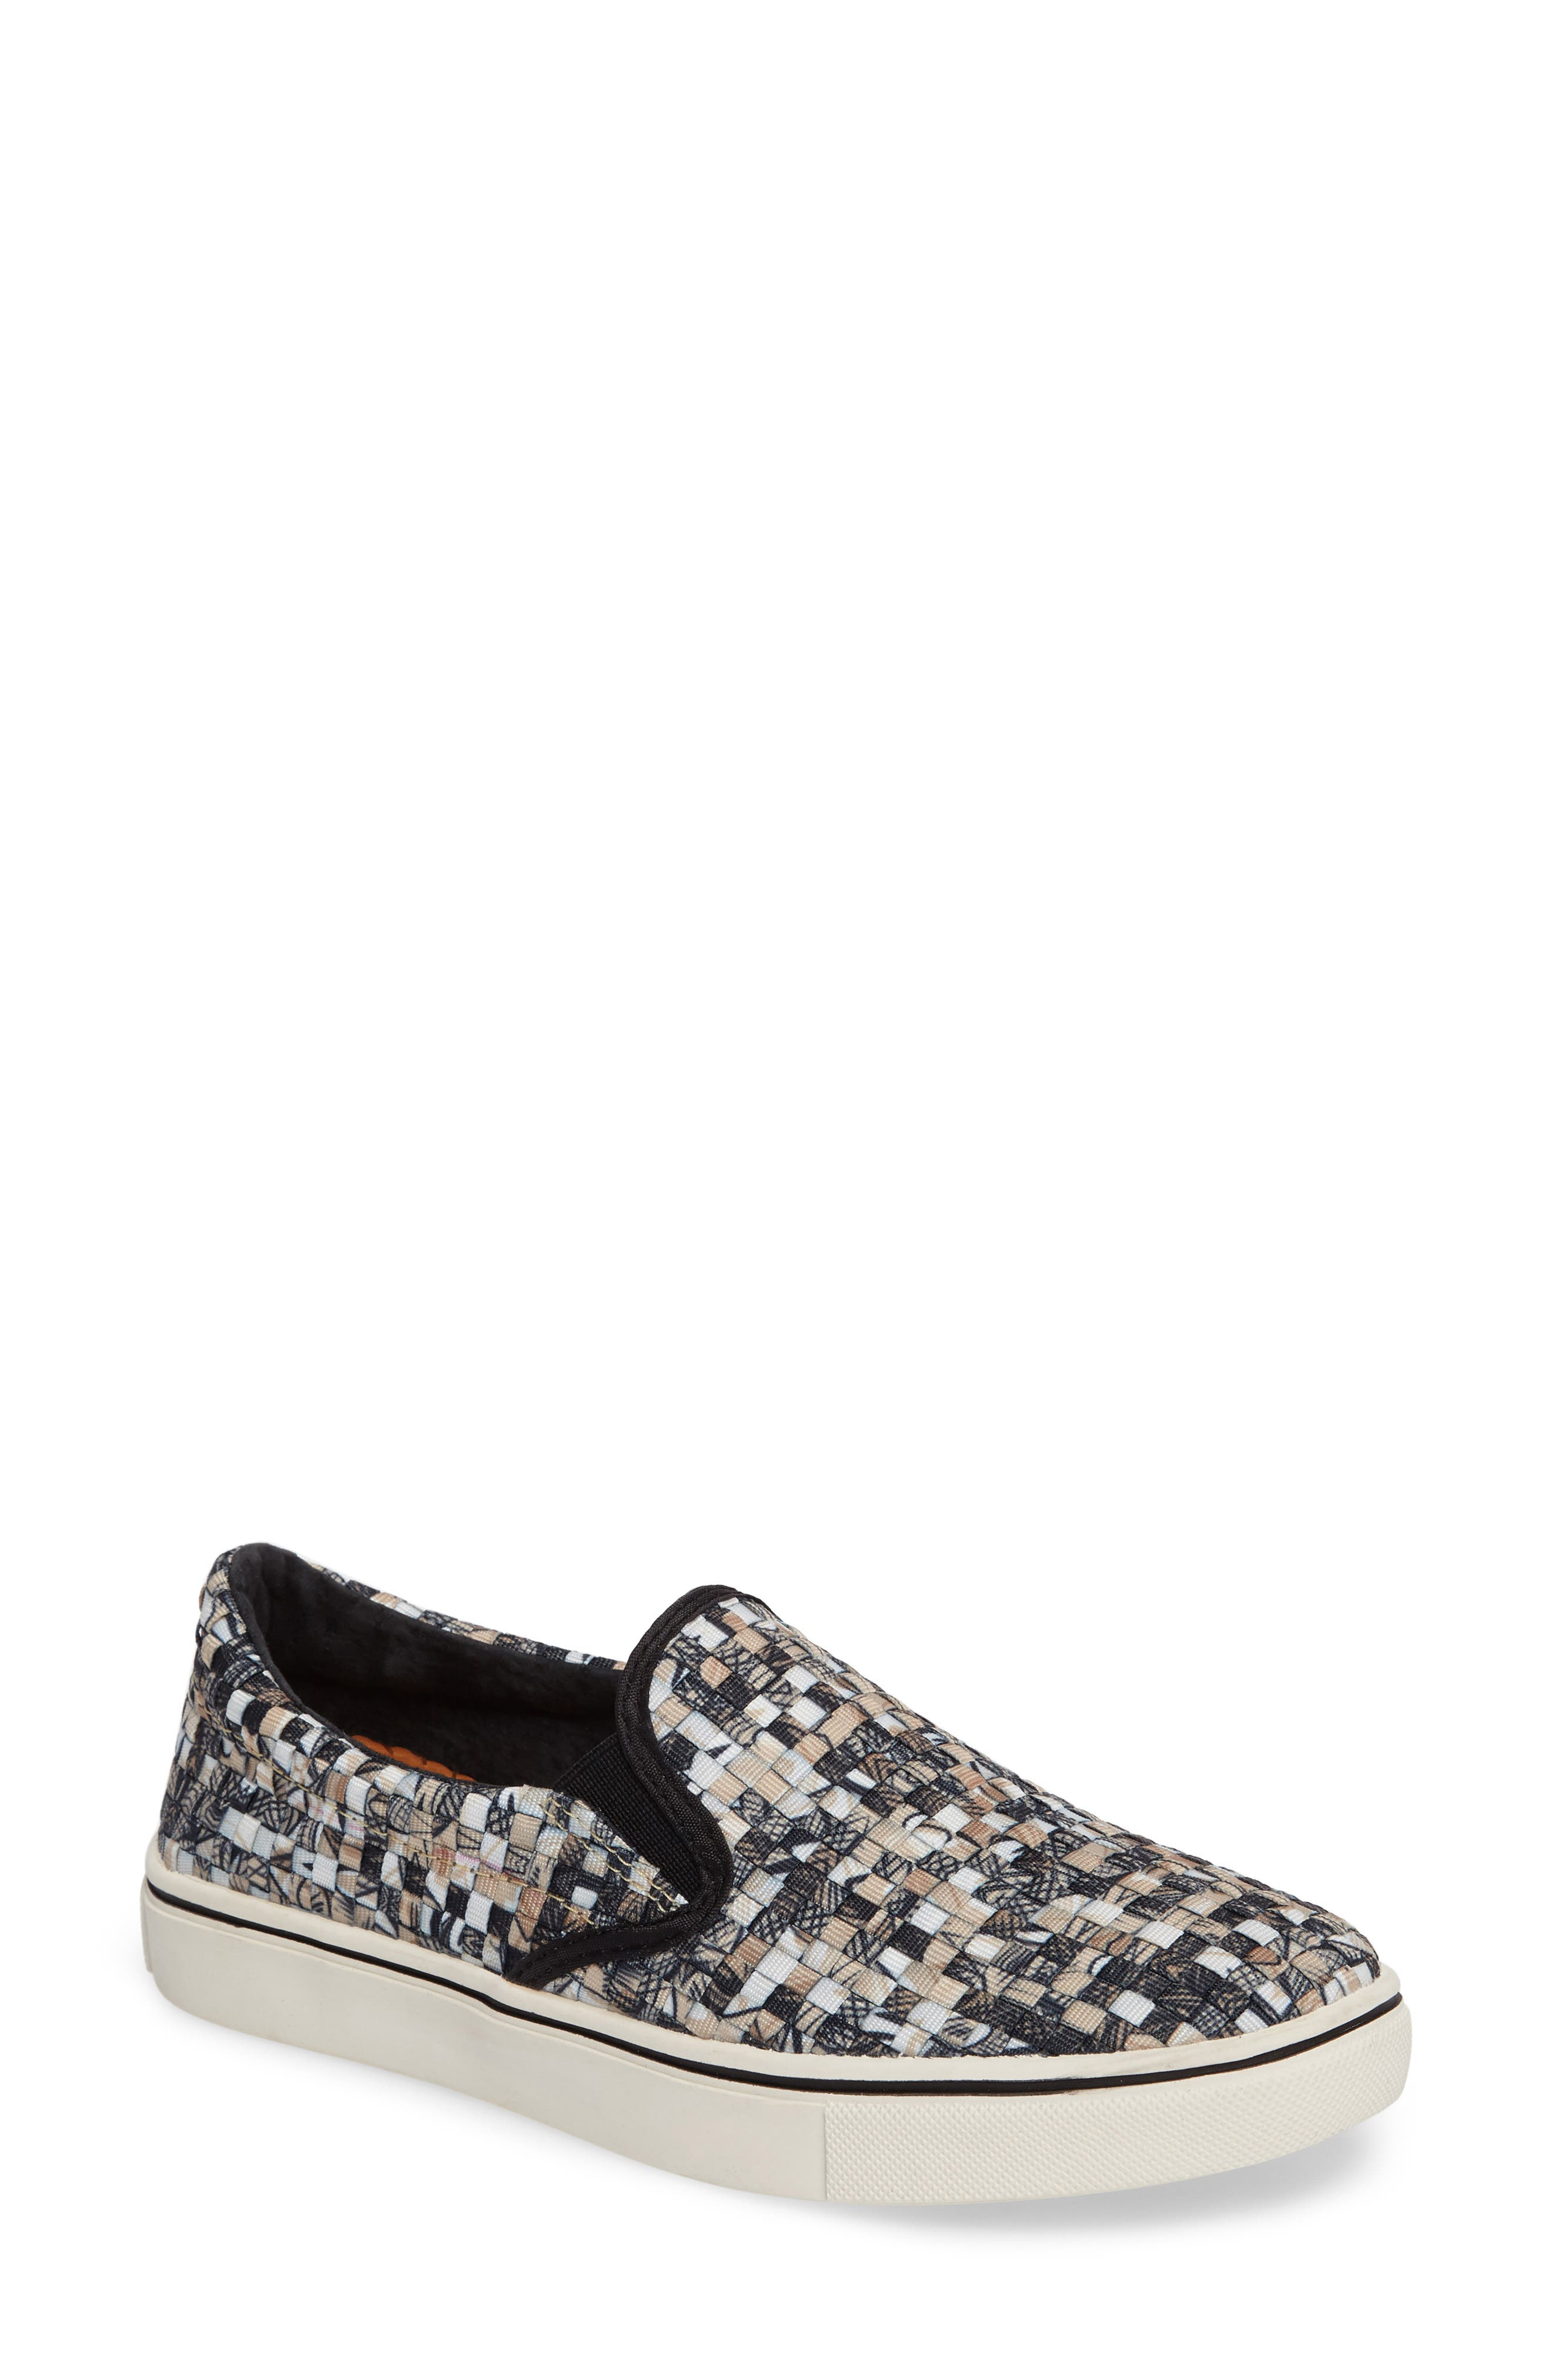 Alternate Image 1 Selected - bernie mev. 'Verona' Slip-On Sneaker (Women)